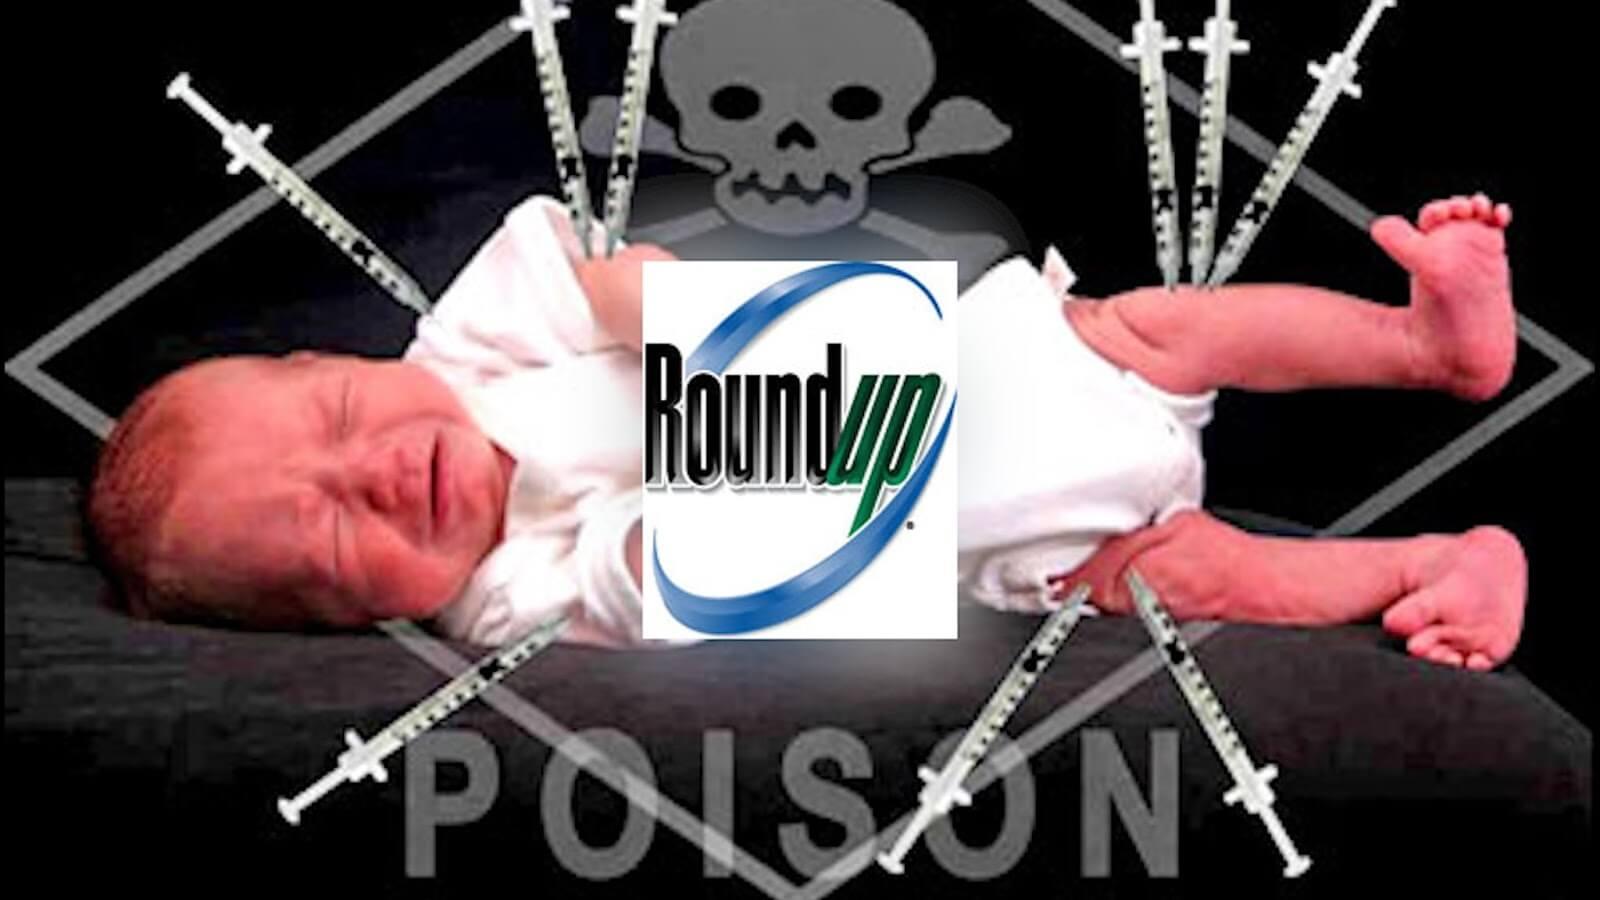 roundup-monsanto-vaccines